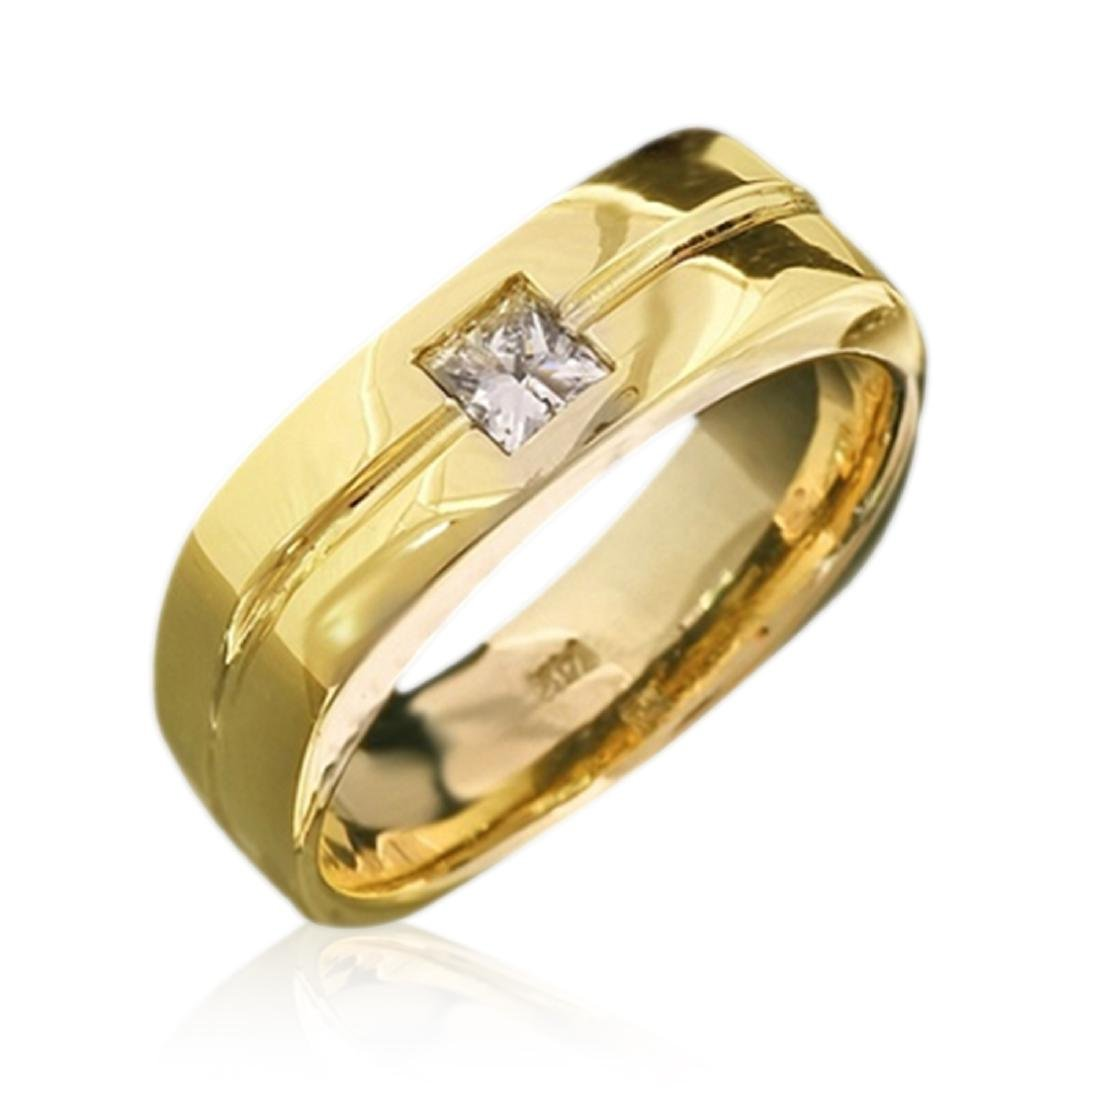 Mens 0.35 Carat Natural Diamond 18K Solid Yellow Gold